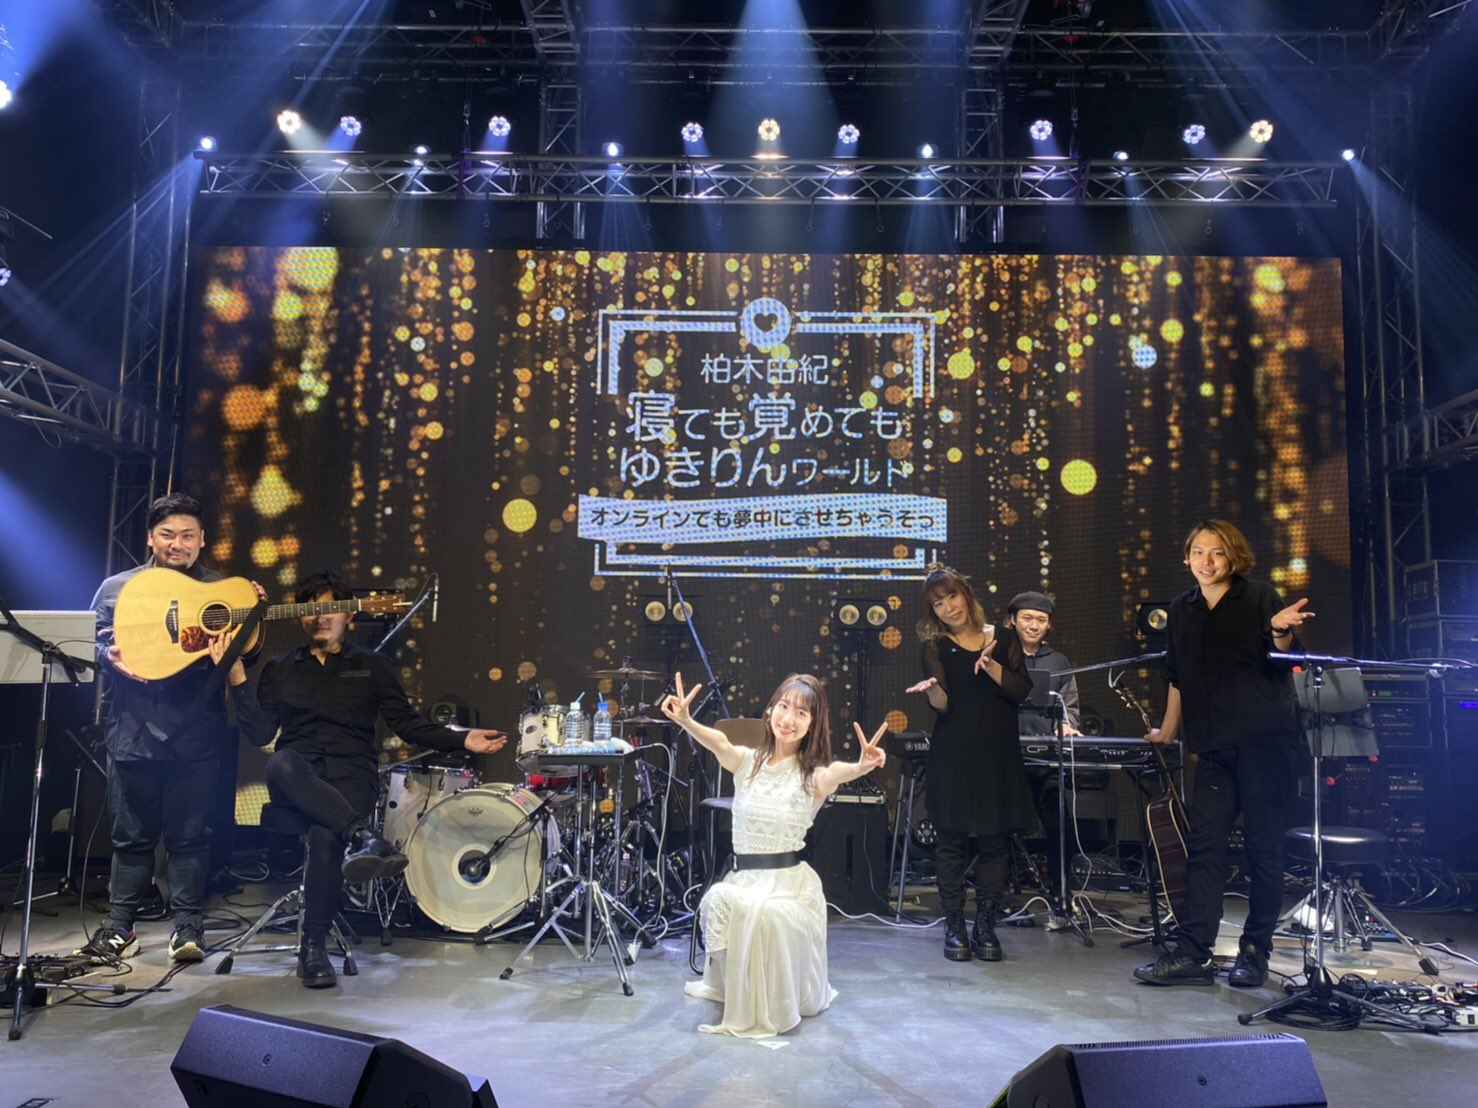 【AKB48】柏木由紀、12月に自身初のディナーショーの開催が決定! 他